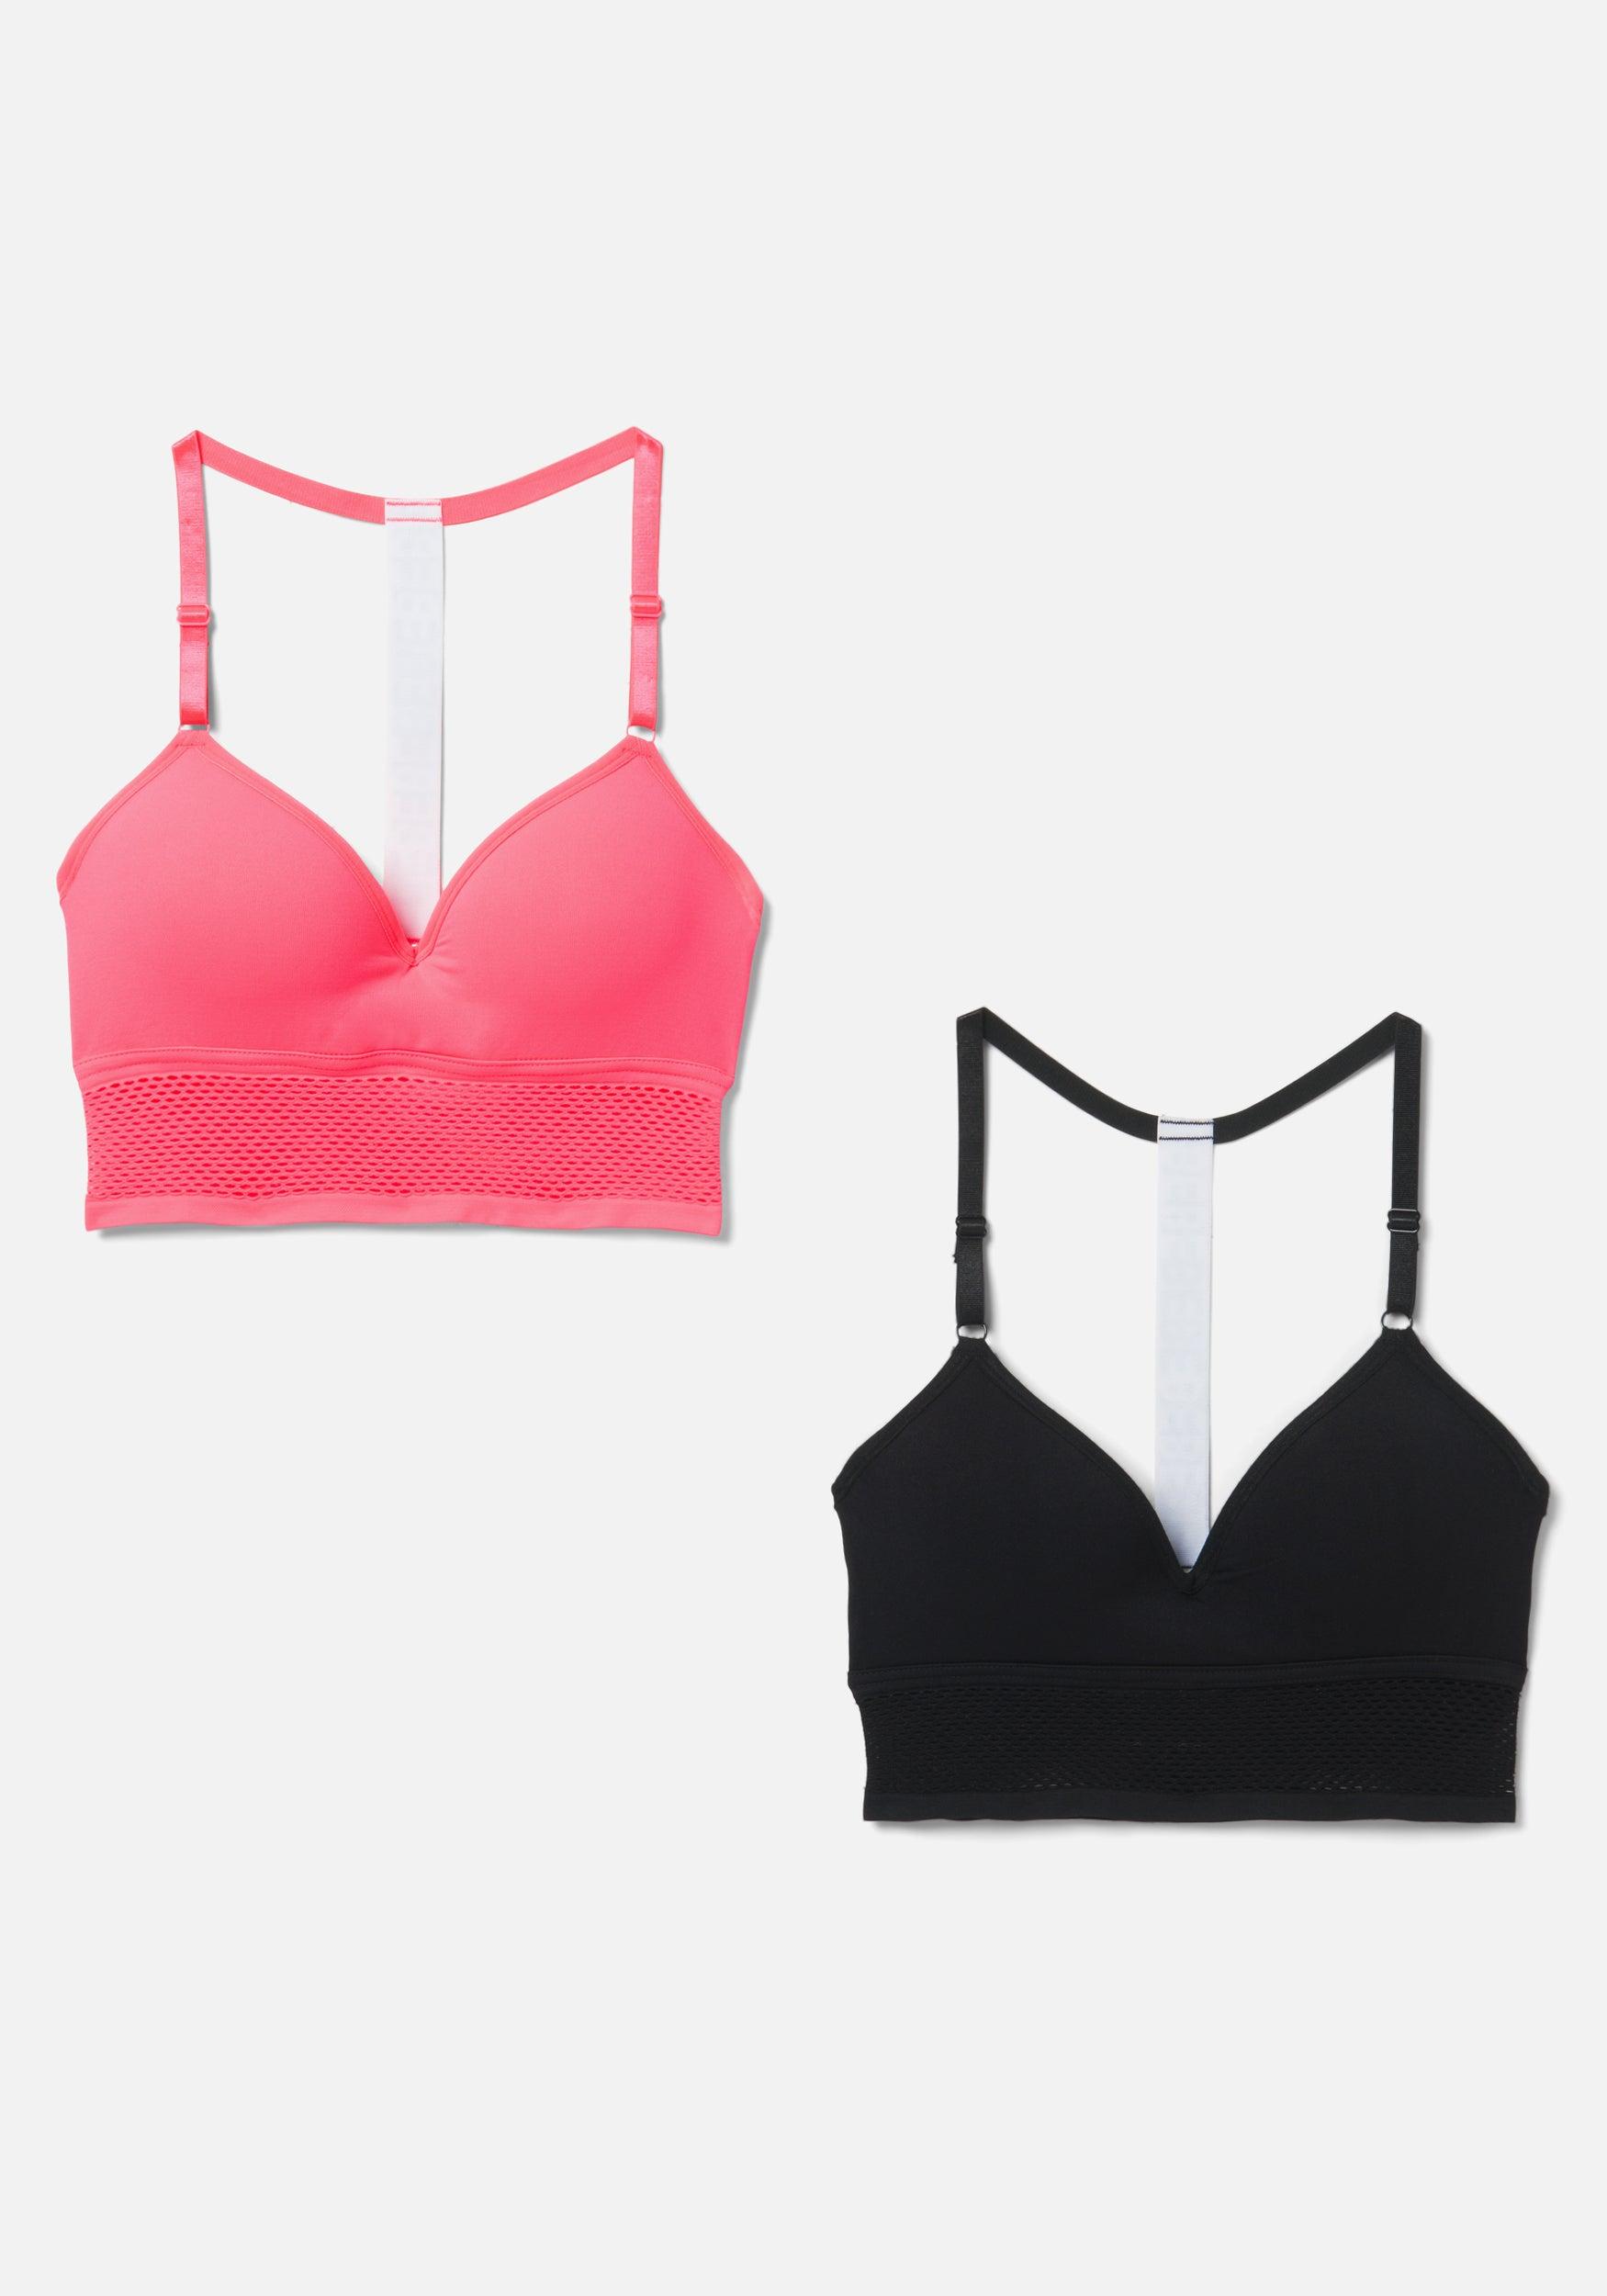 bebe Women's Bebe Logo 2 Pack Sports Bra, Size XL in Pink Glow Spandex/Nylon